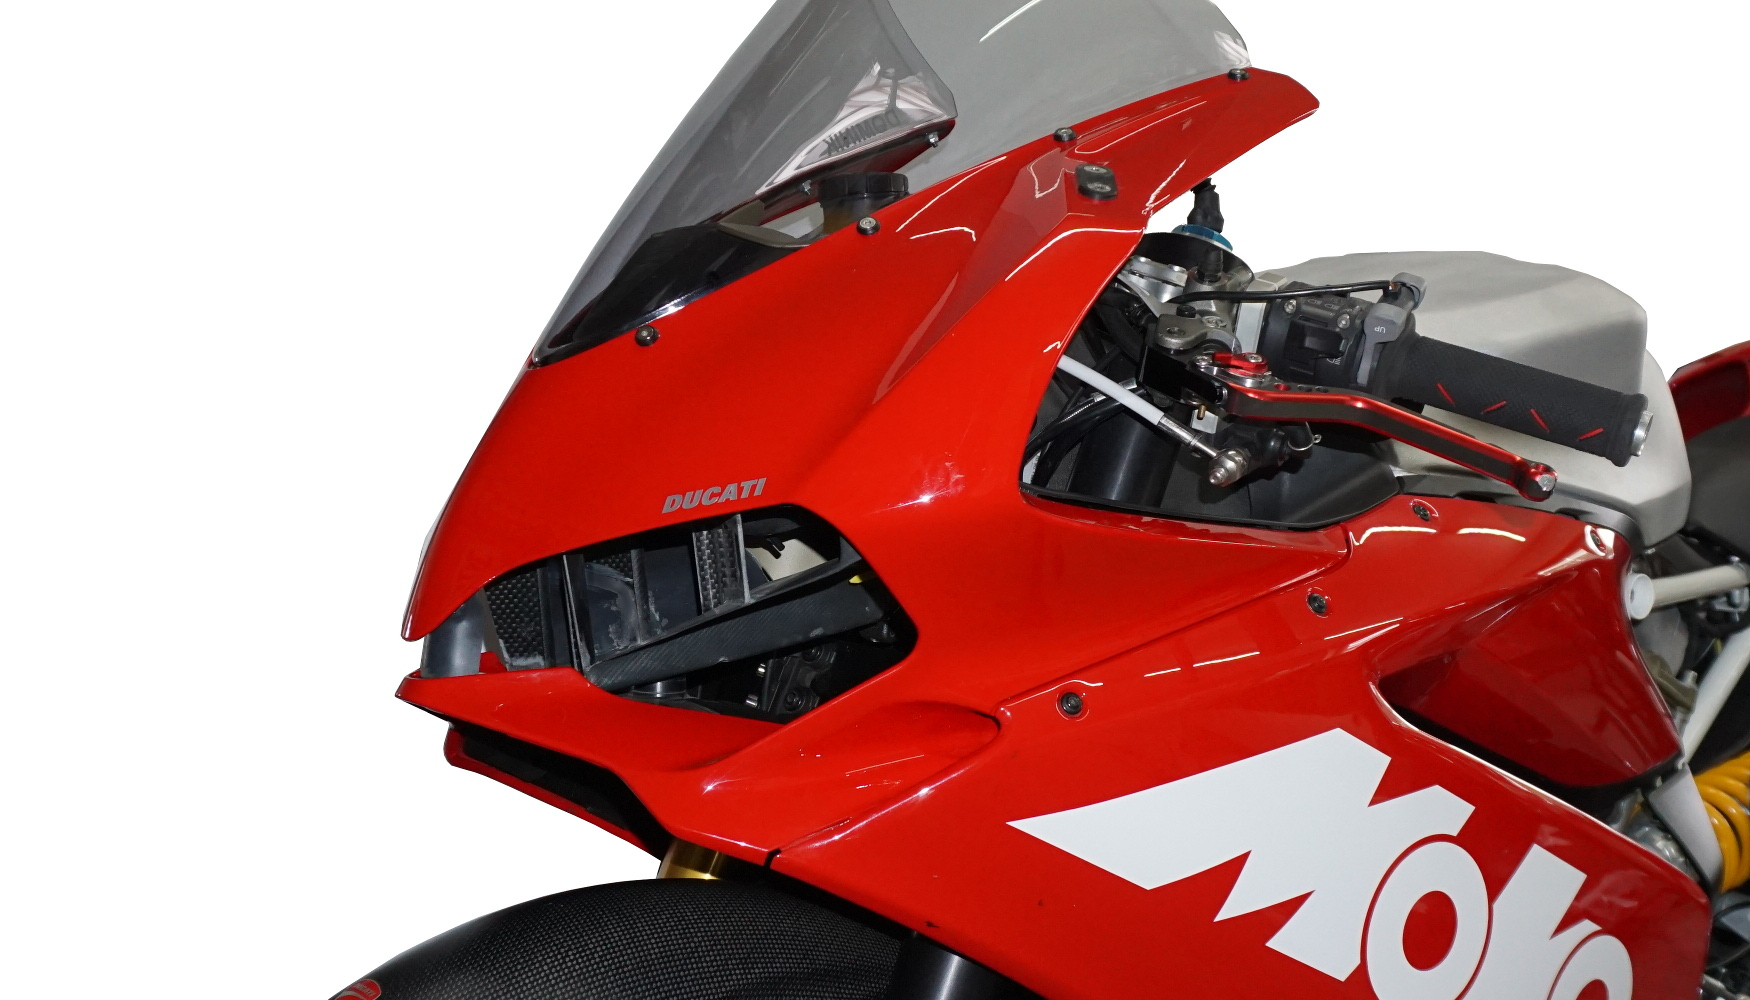 Lufteinlass Moko Ducati Panigale montiert 08.002.13 mit Verkleidung